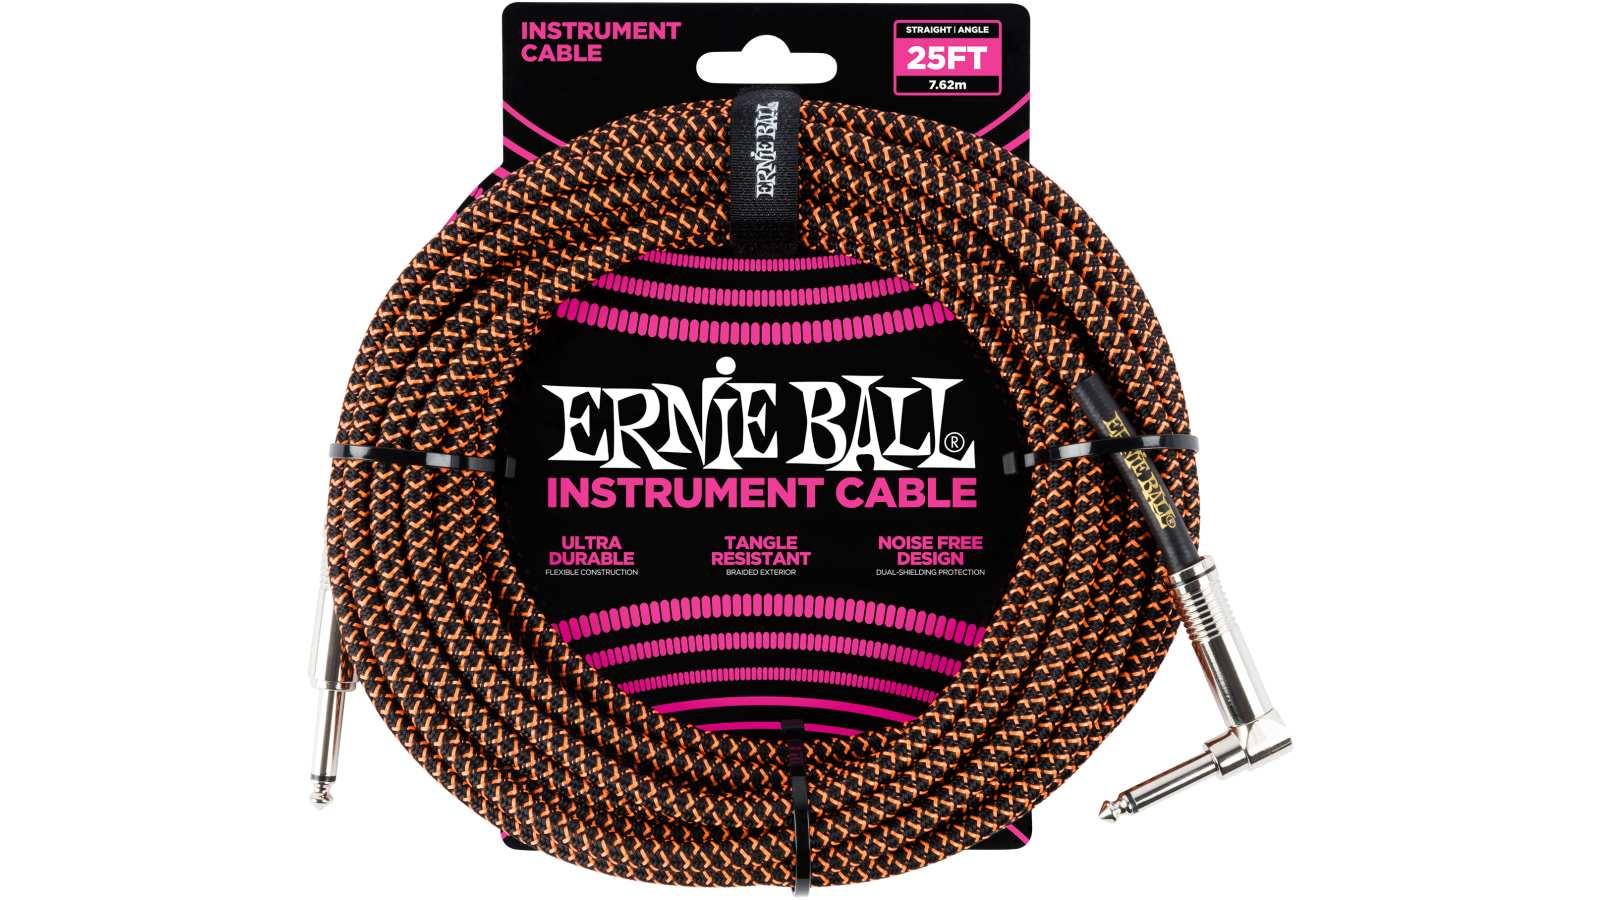 Ernie Ball EB6064 Gitarren Kabel 7,62m